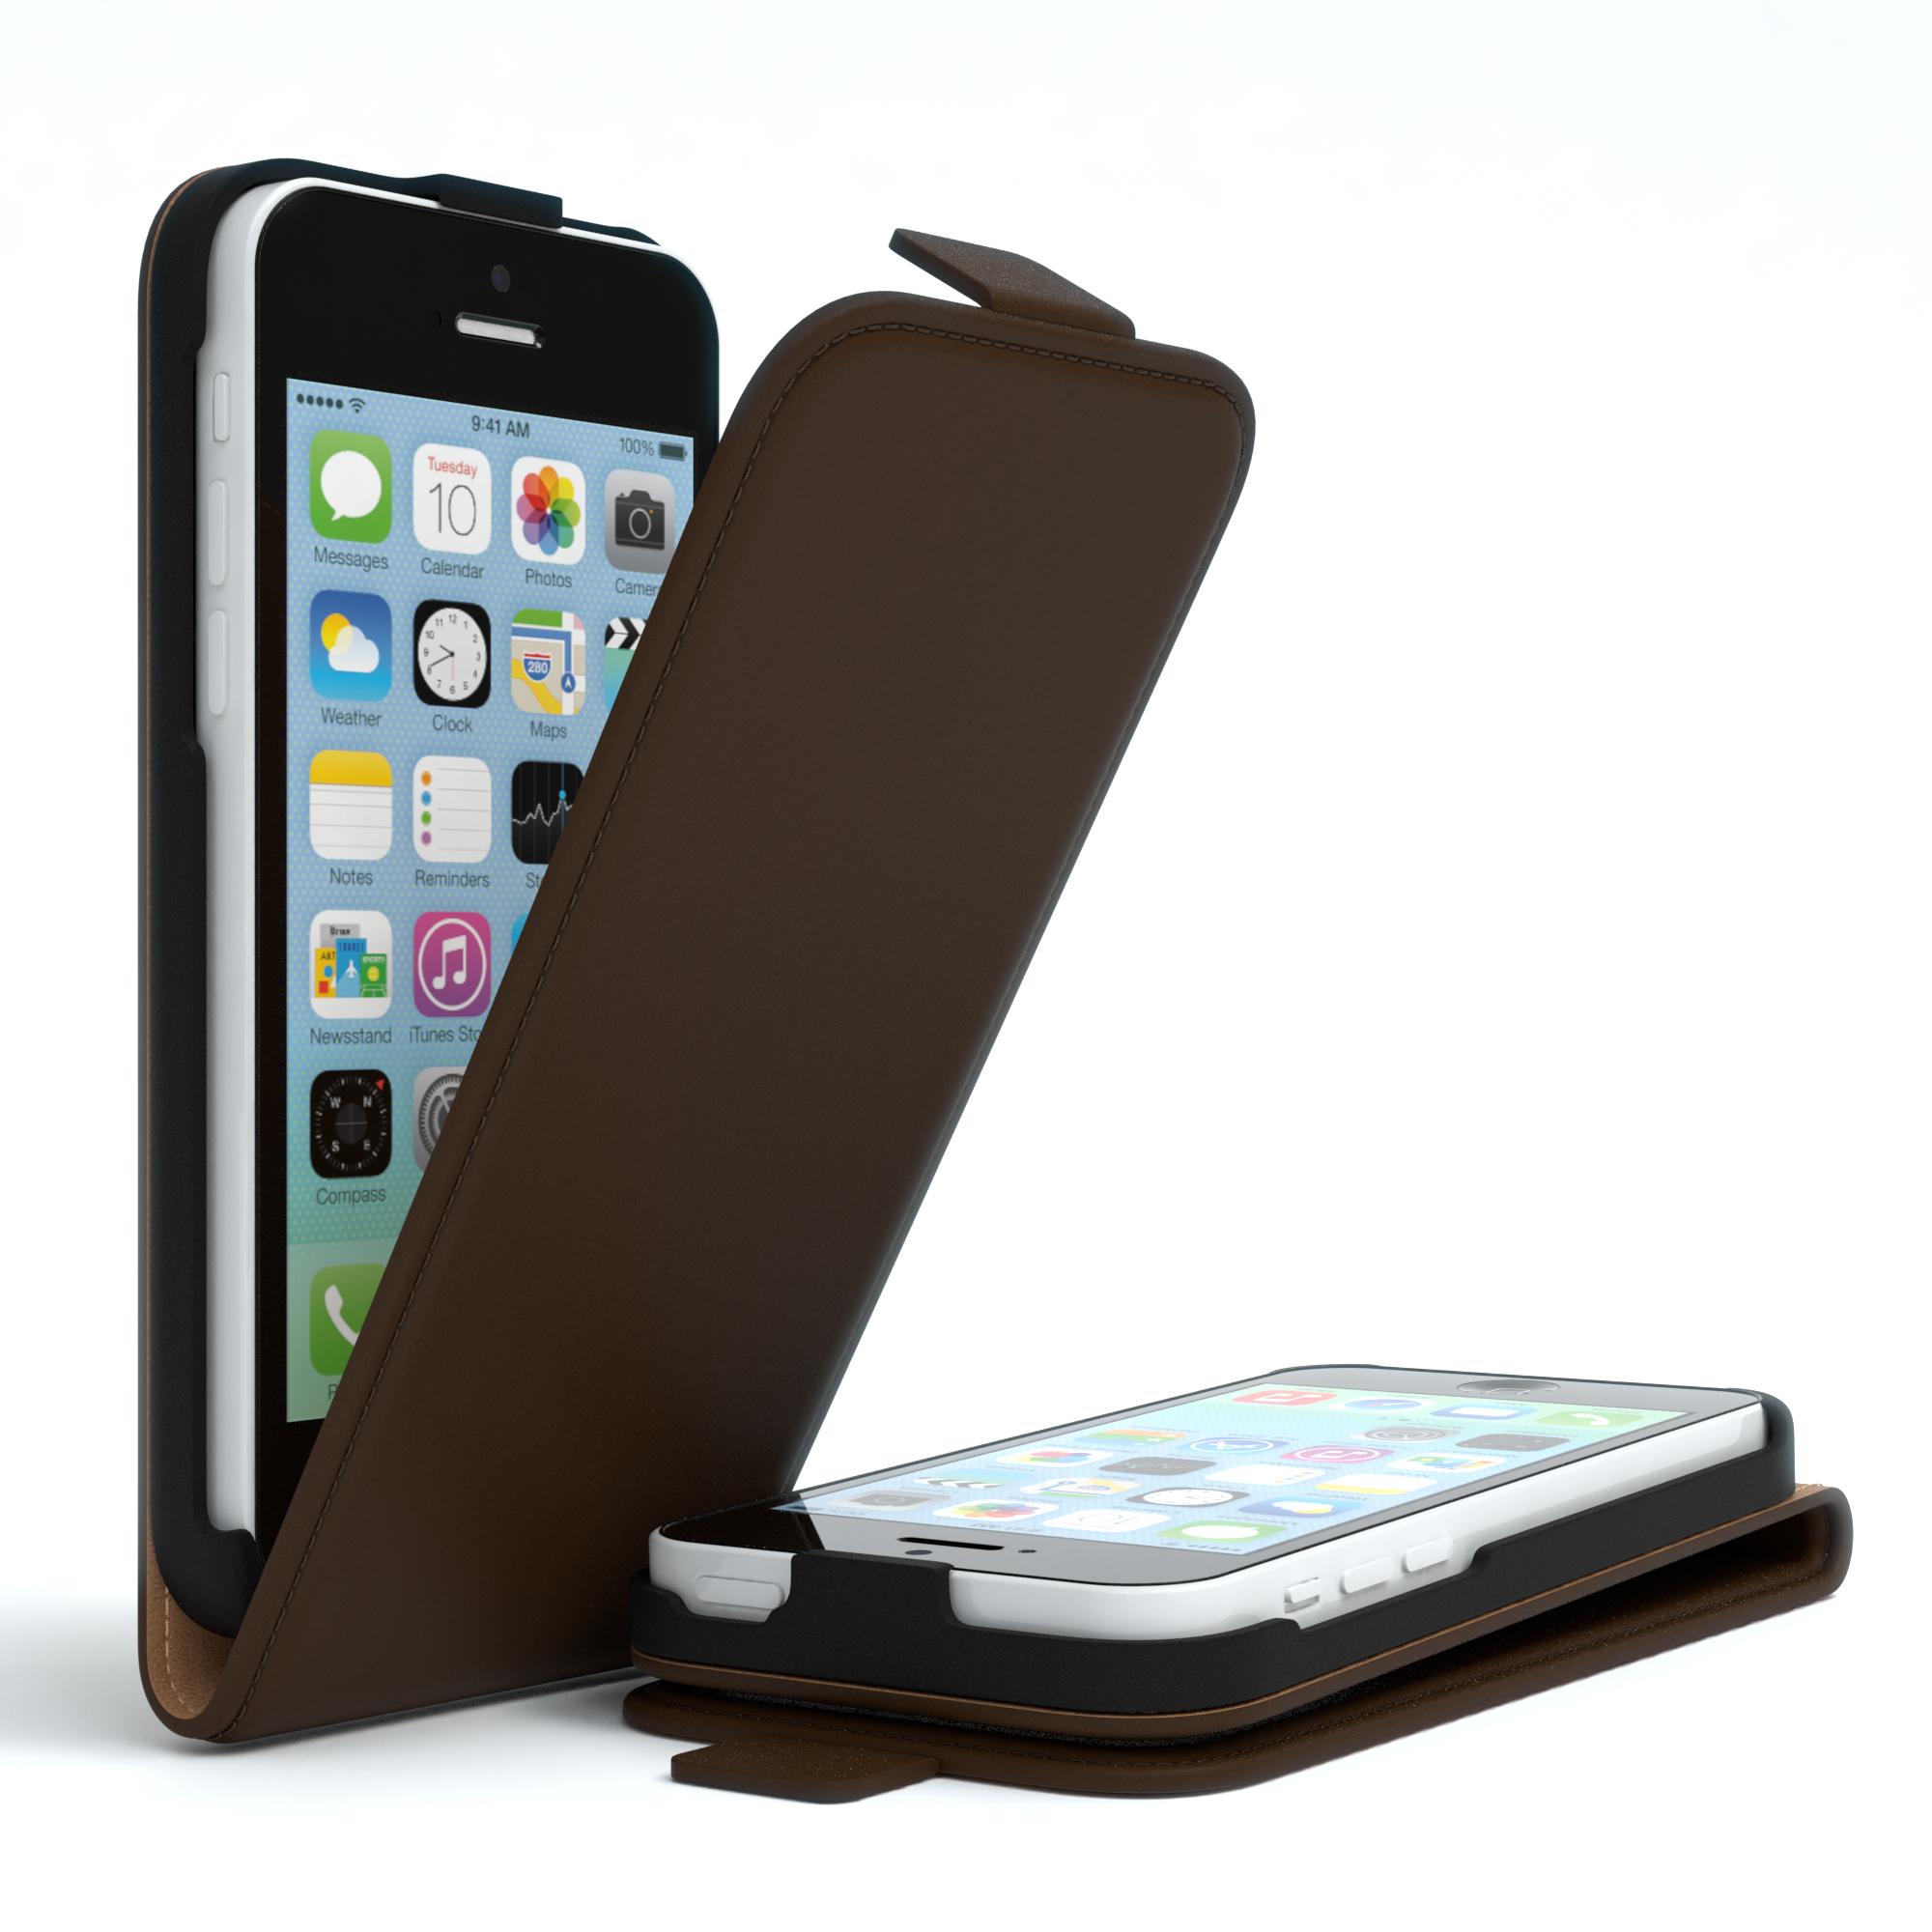 Phone-Case-for-Apple-iPhone-5c-FlipCase-Cover-Pouch-klappcase